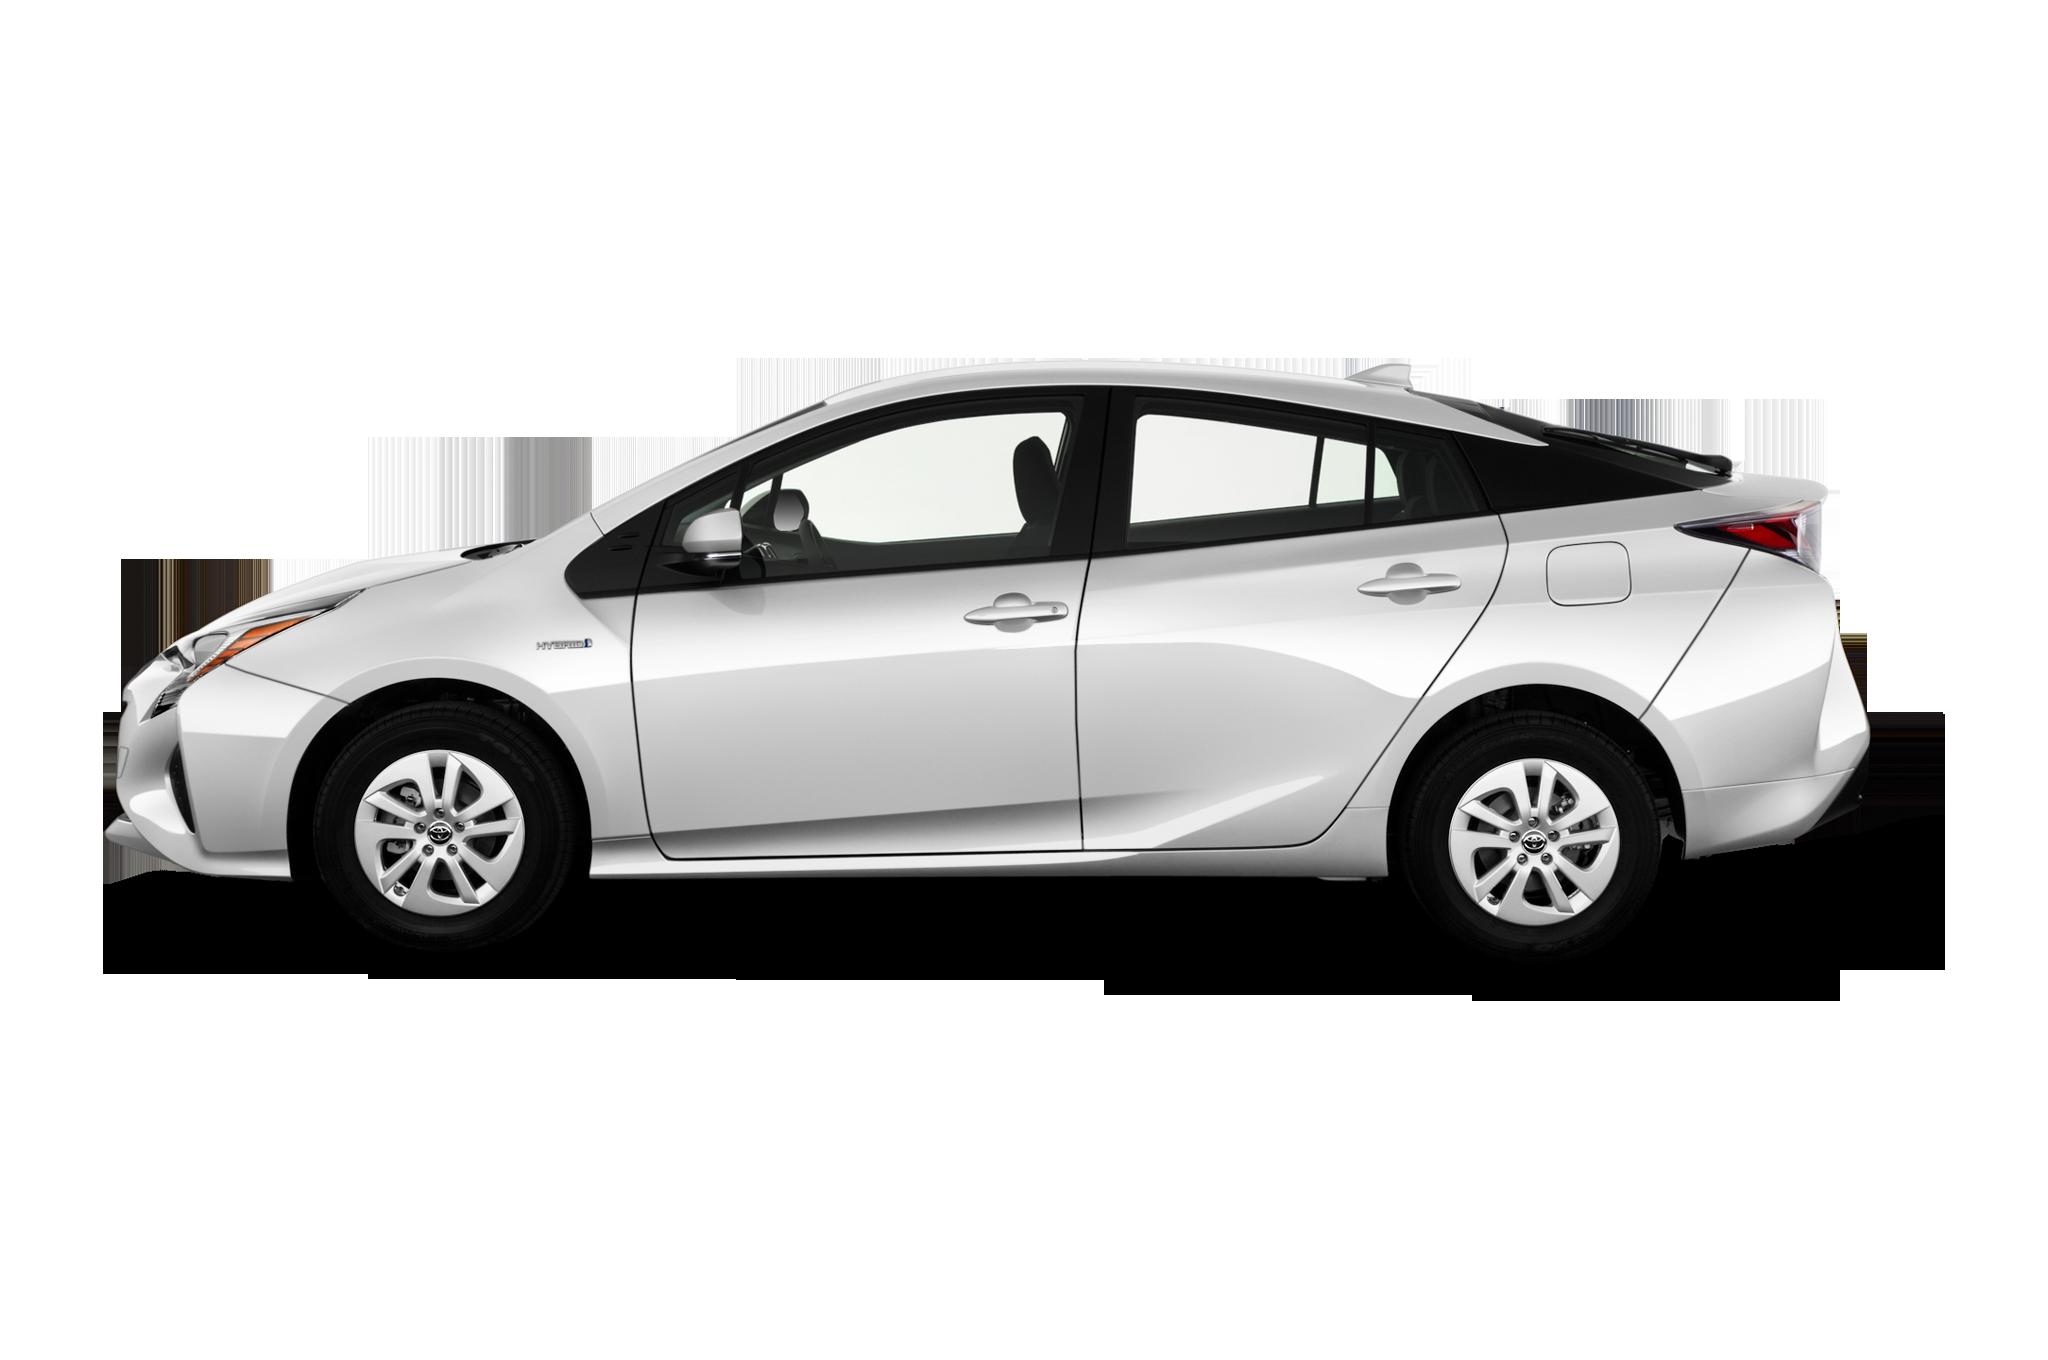 More 2016 Toyota Prius Technical Secrets Revealed